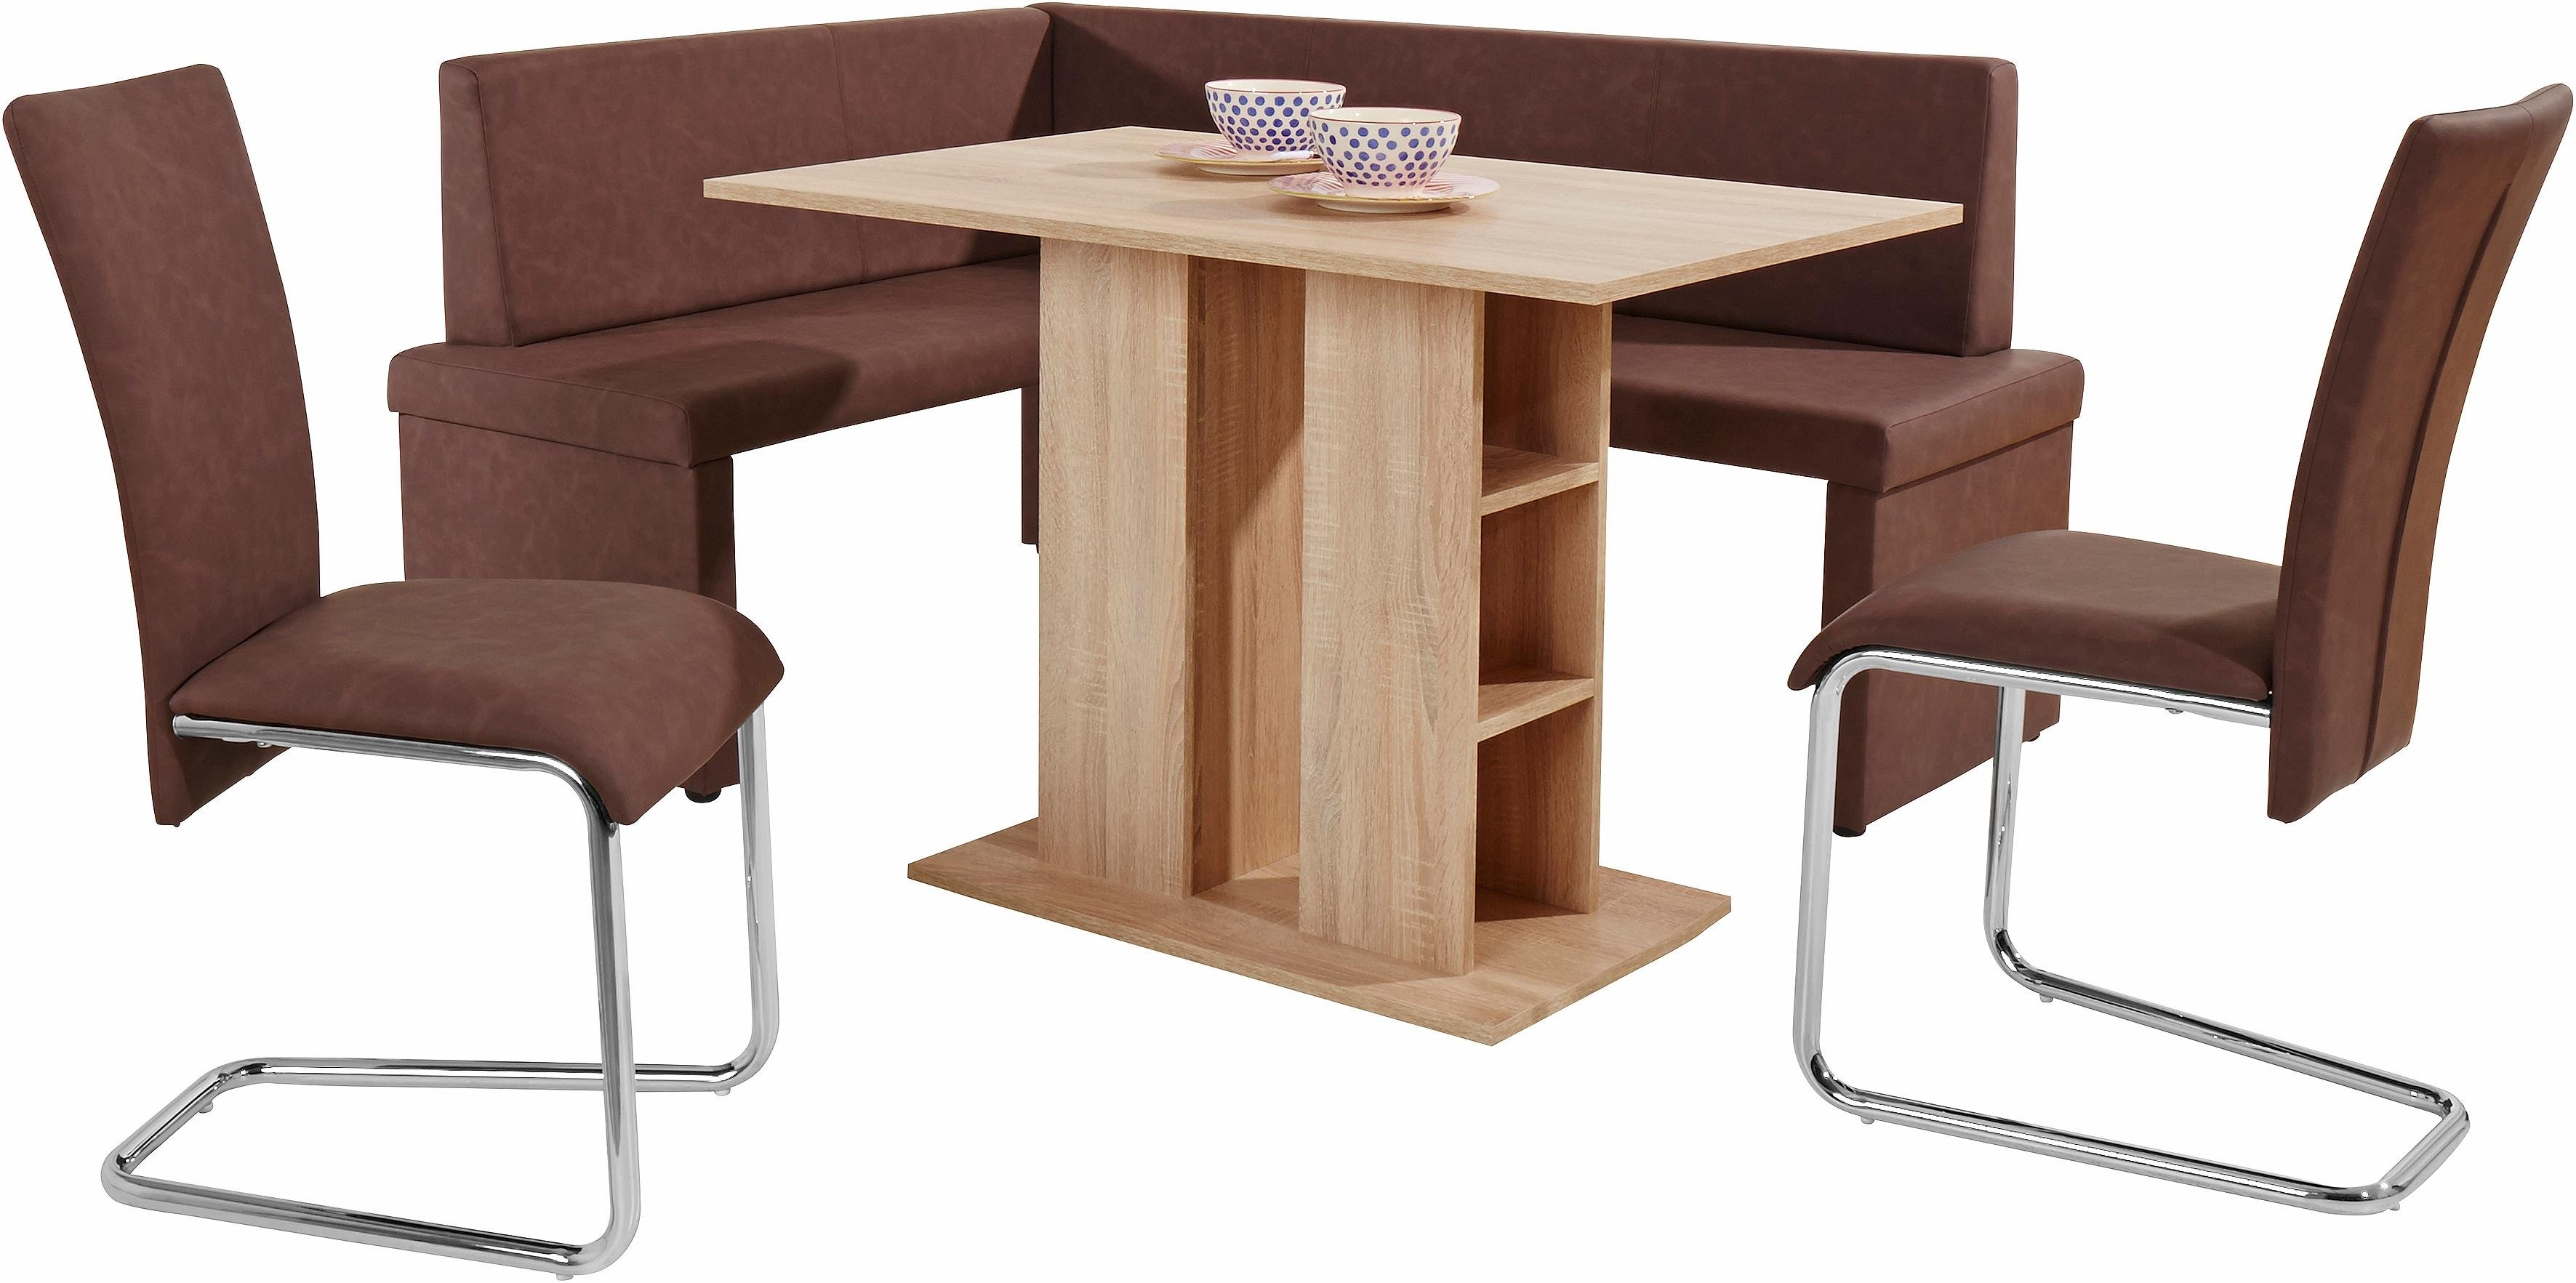 steinhoff eethoek 4 delig online bestellen otto. Black Bedroom Furniture Sets. Home Design Ideas